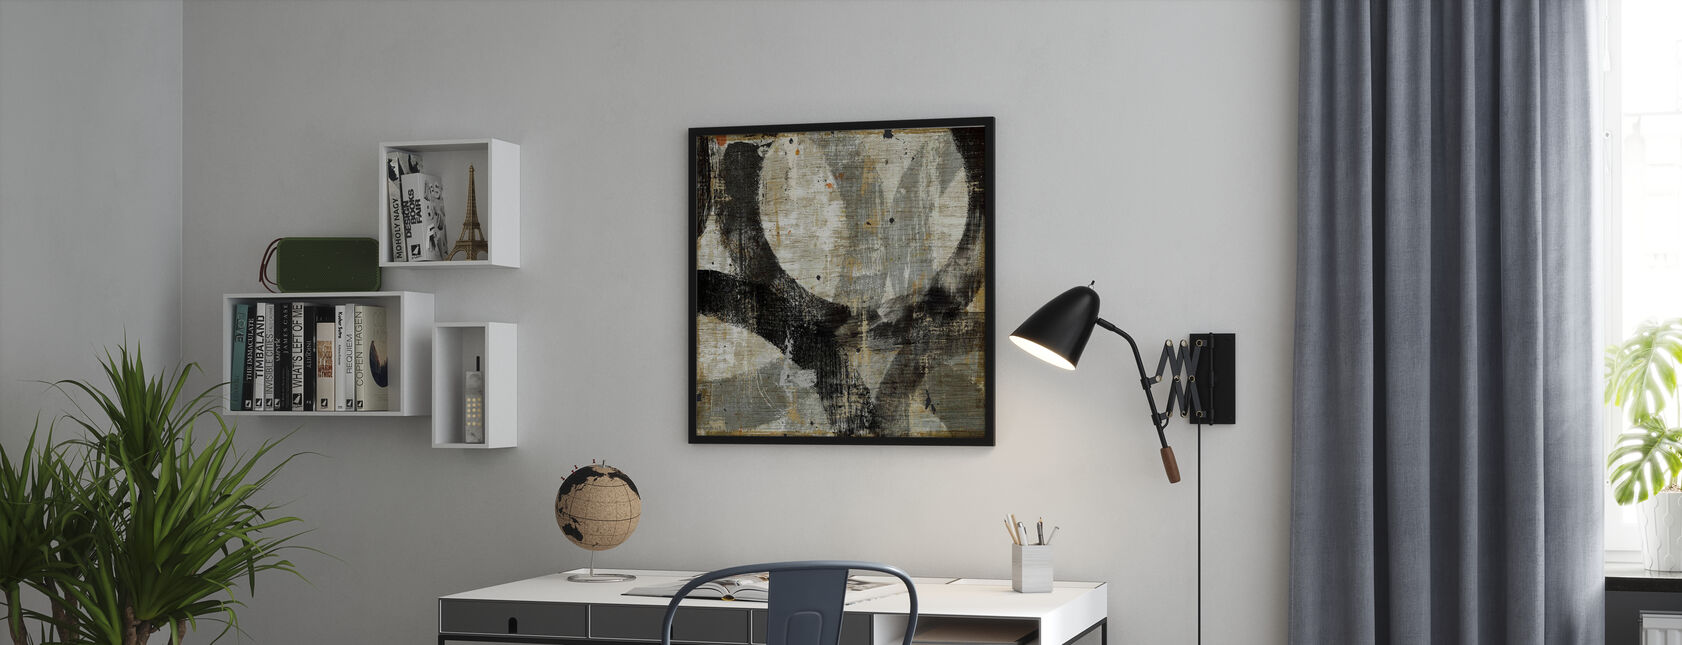 Geometric Abstract II - Framed print - Office